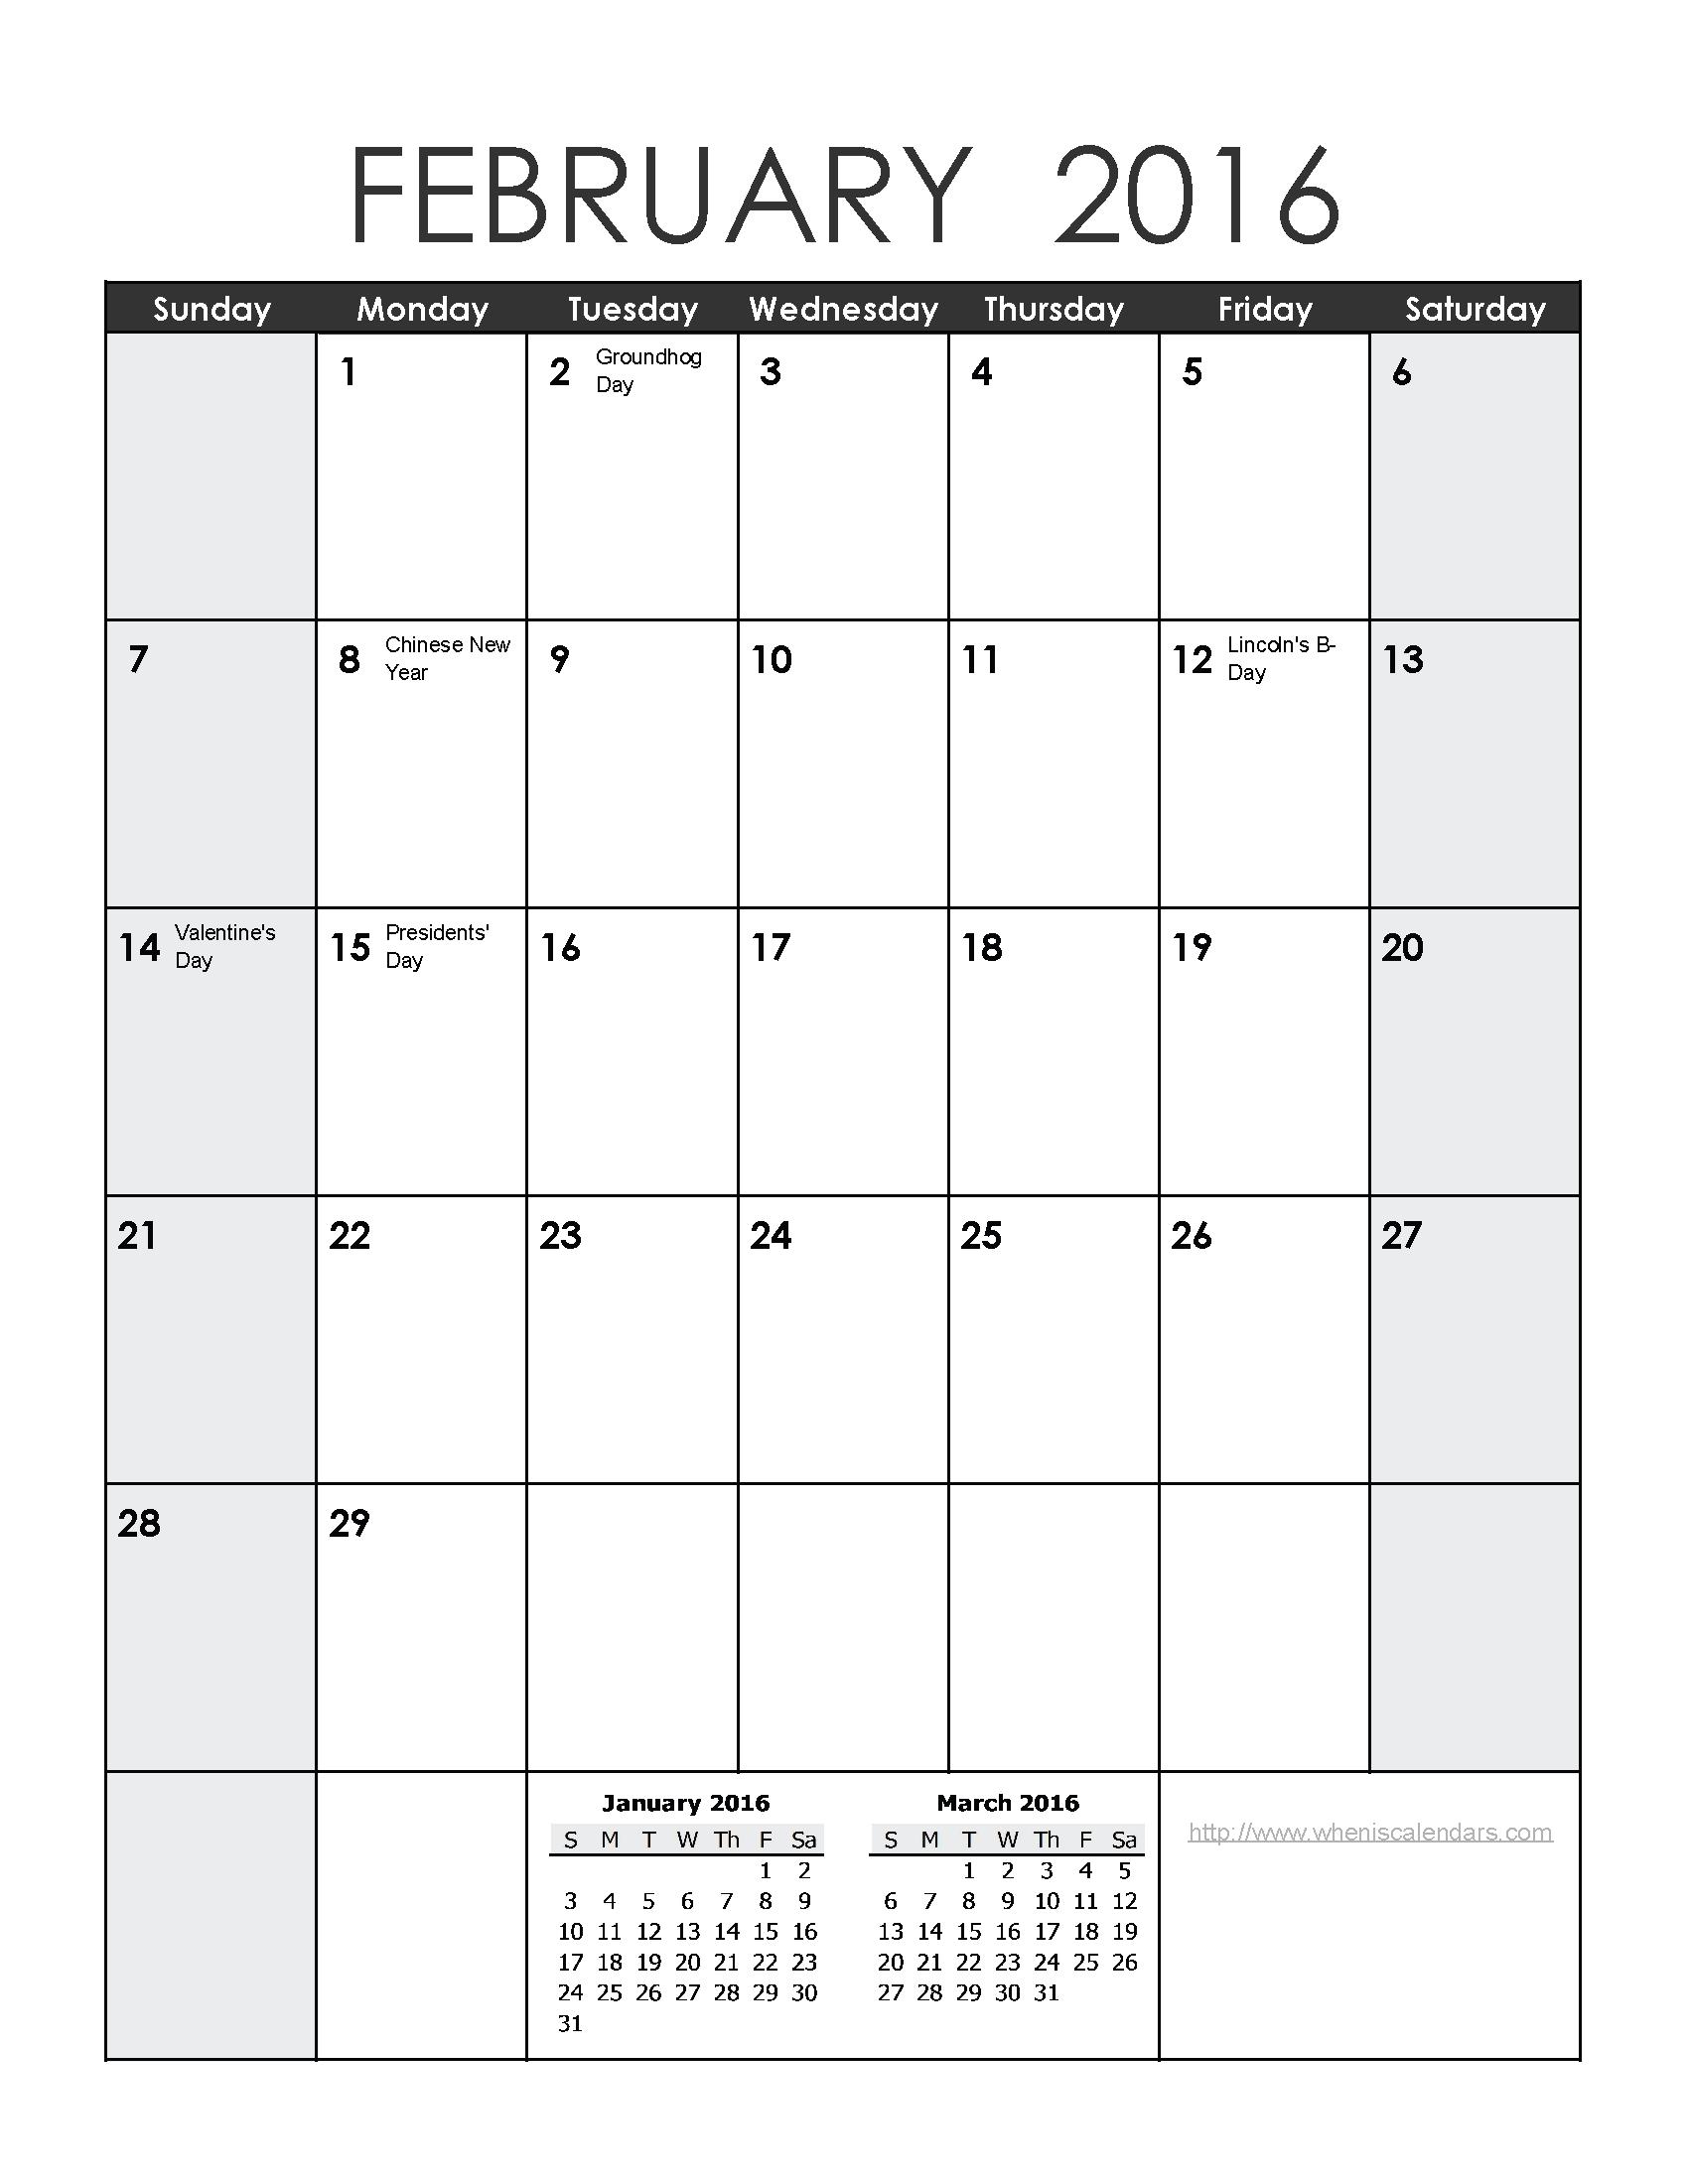 Calendar clipart november 2016 svg library library February 2016 calendar clipart - ClipartFest svg library library